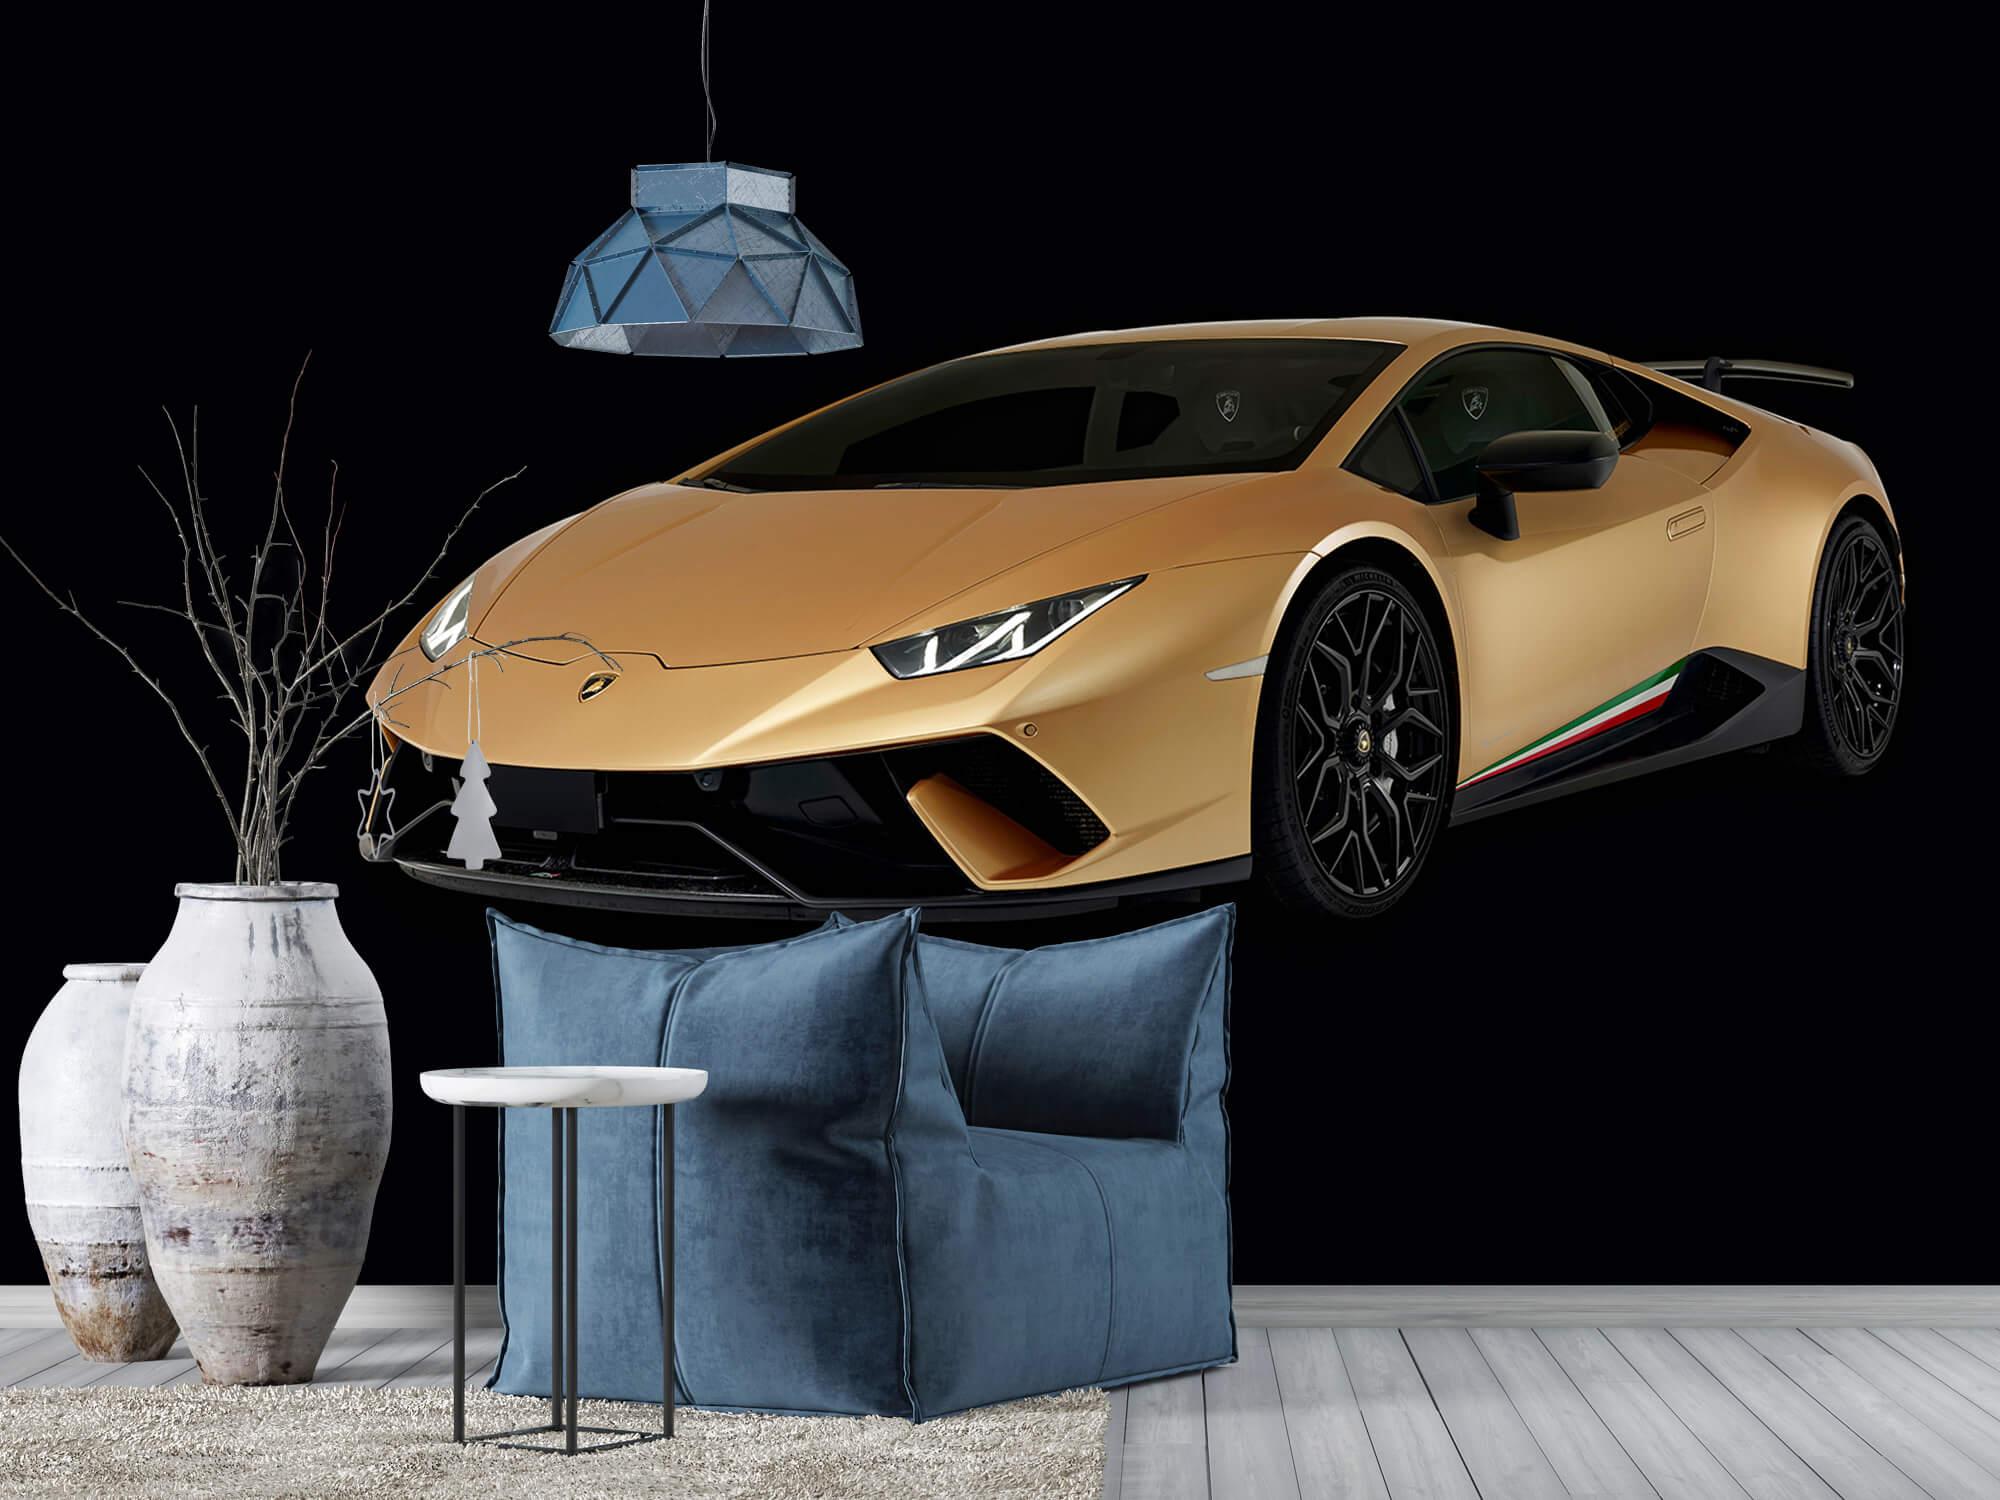 Wallpaper Lamborghini Huracán - Rechter voorkant, zwart 10